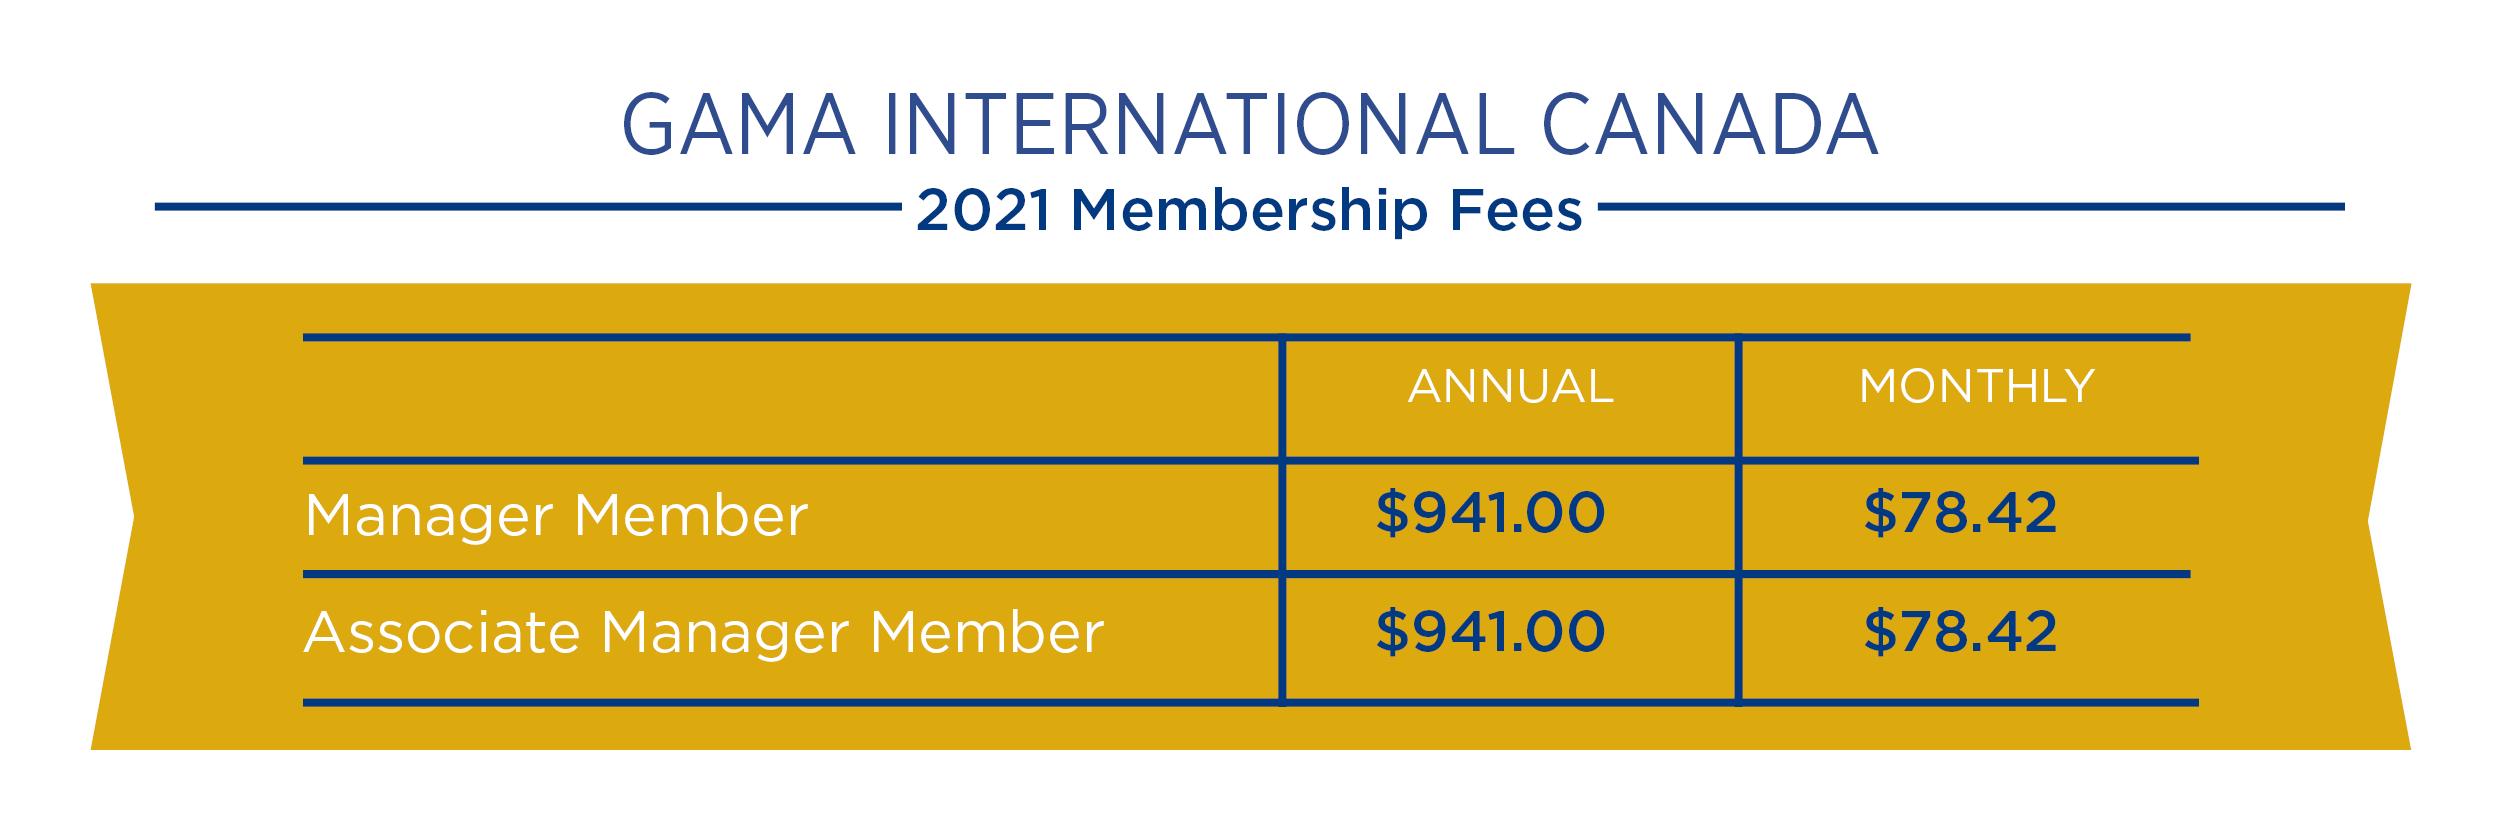 2021 Membership Fee chart